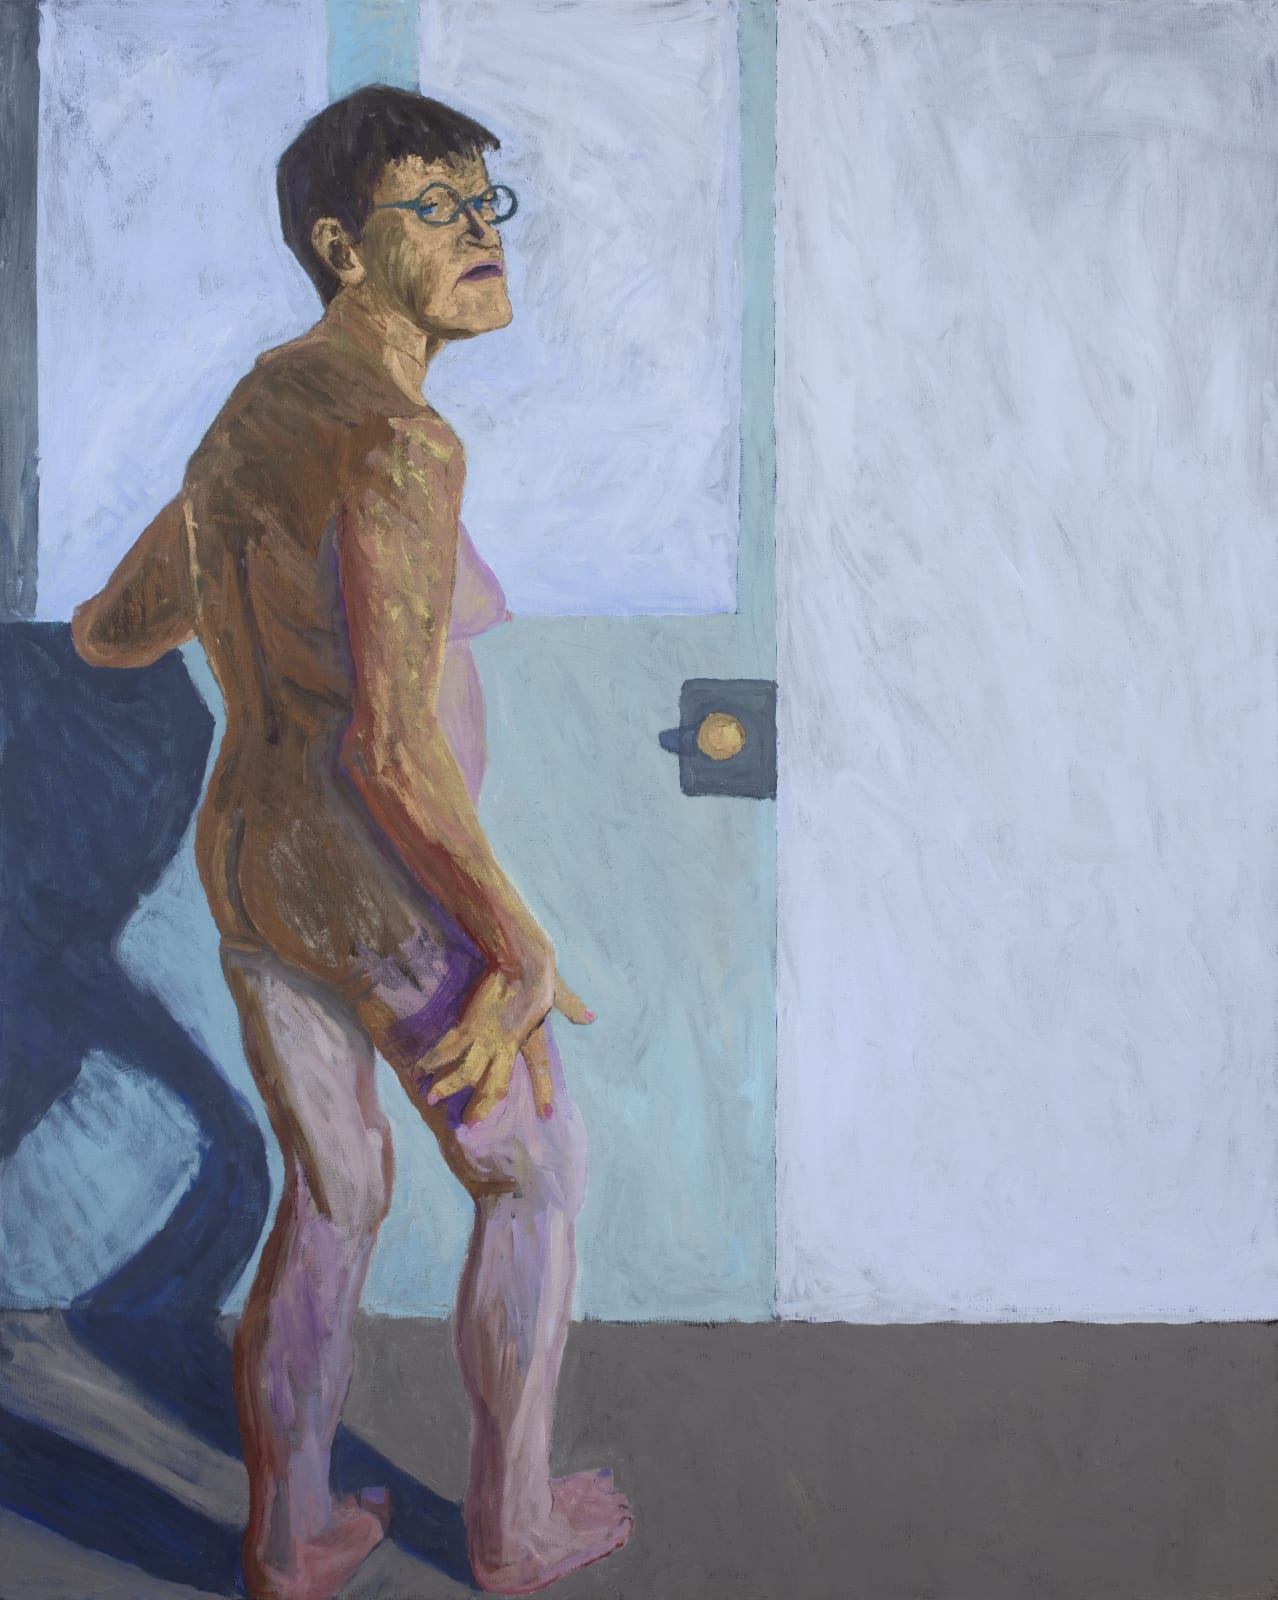 Lucy Jones, Being 66, Being, 2021